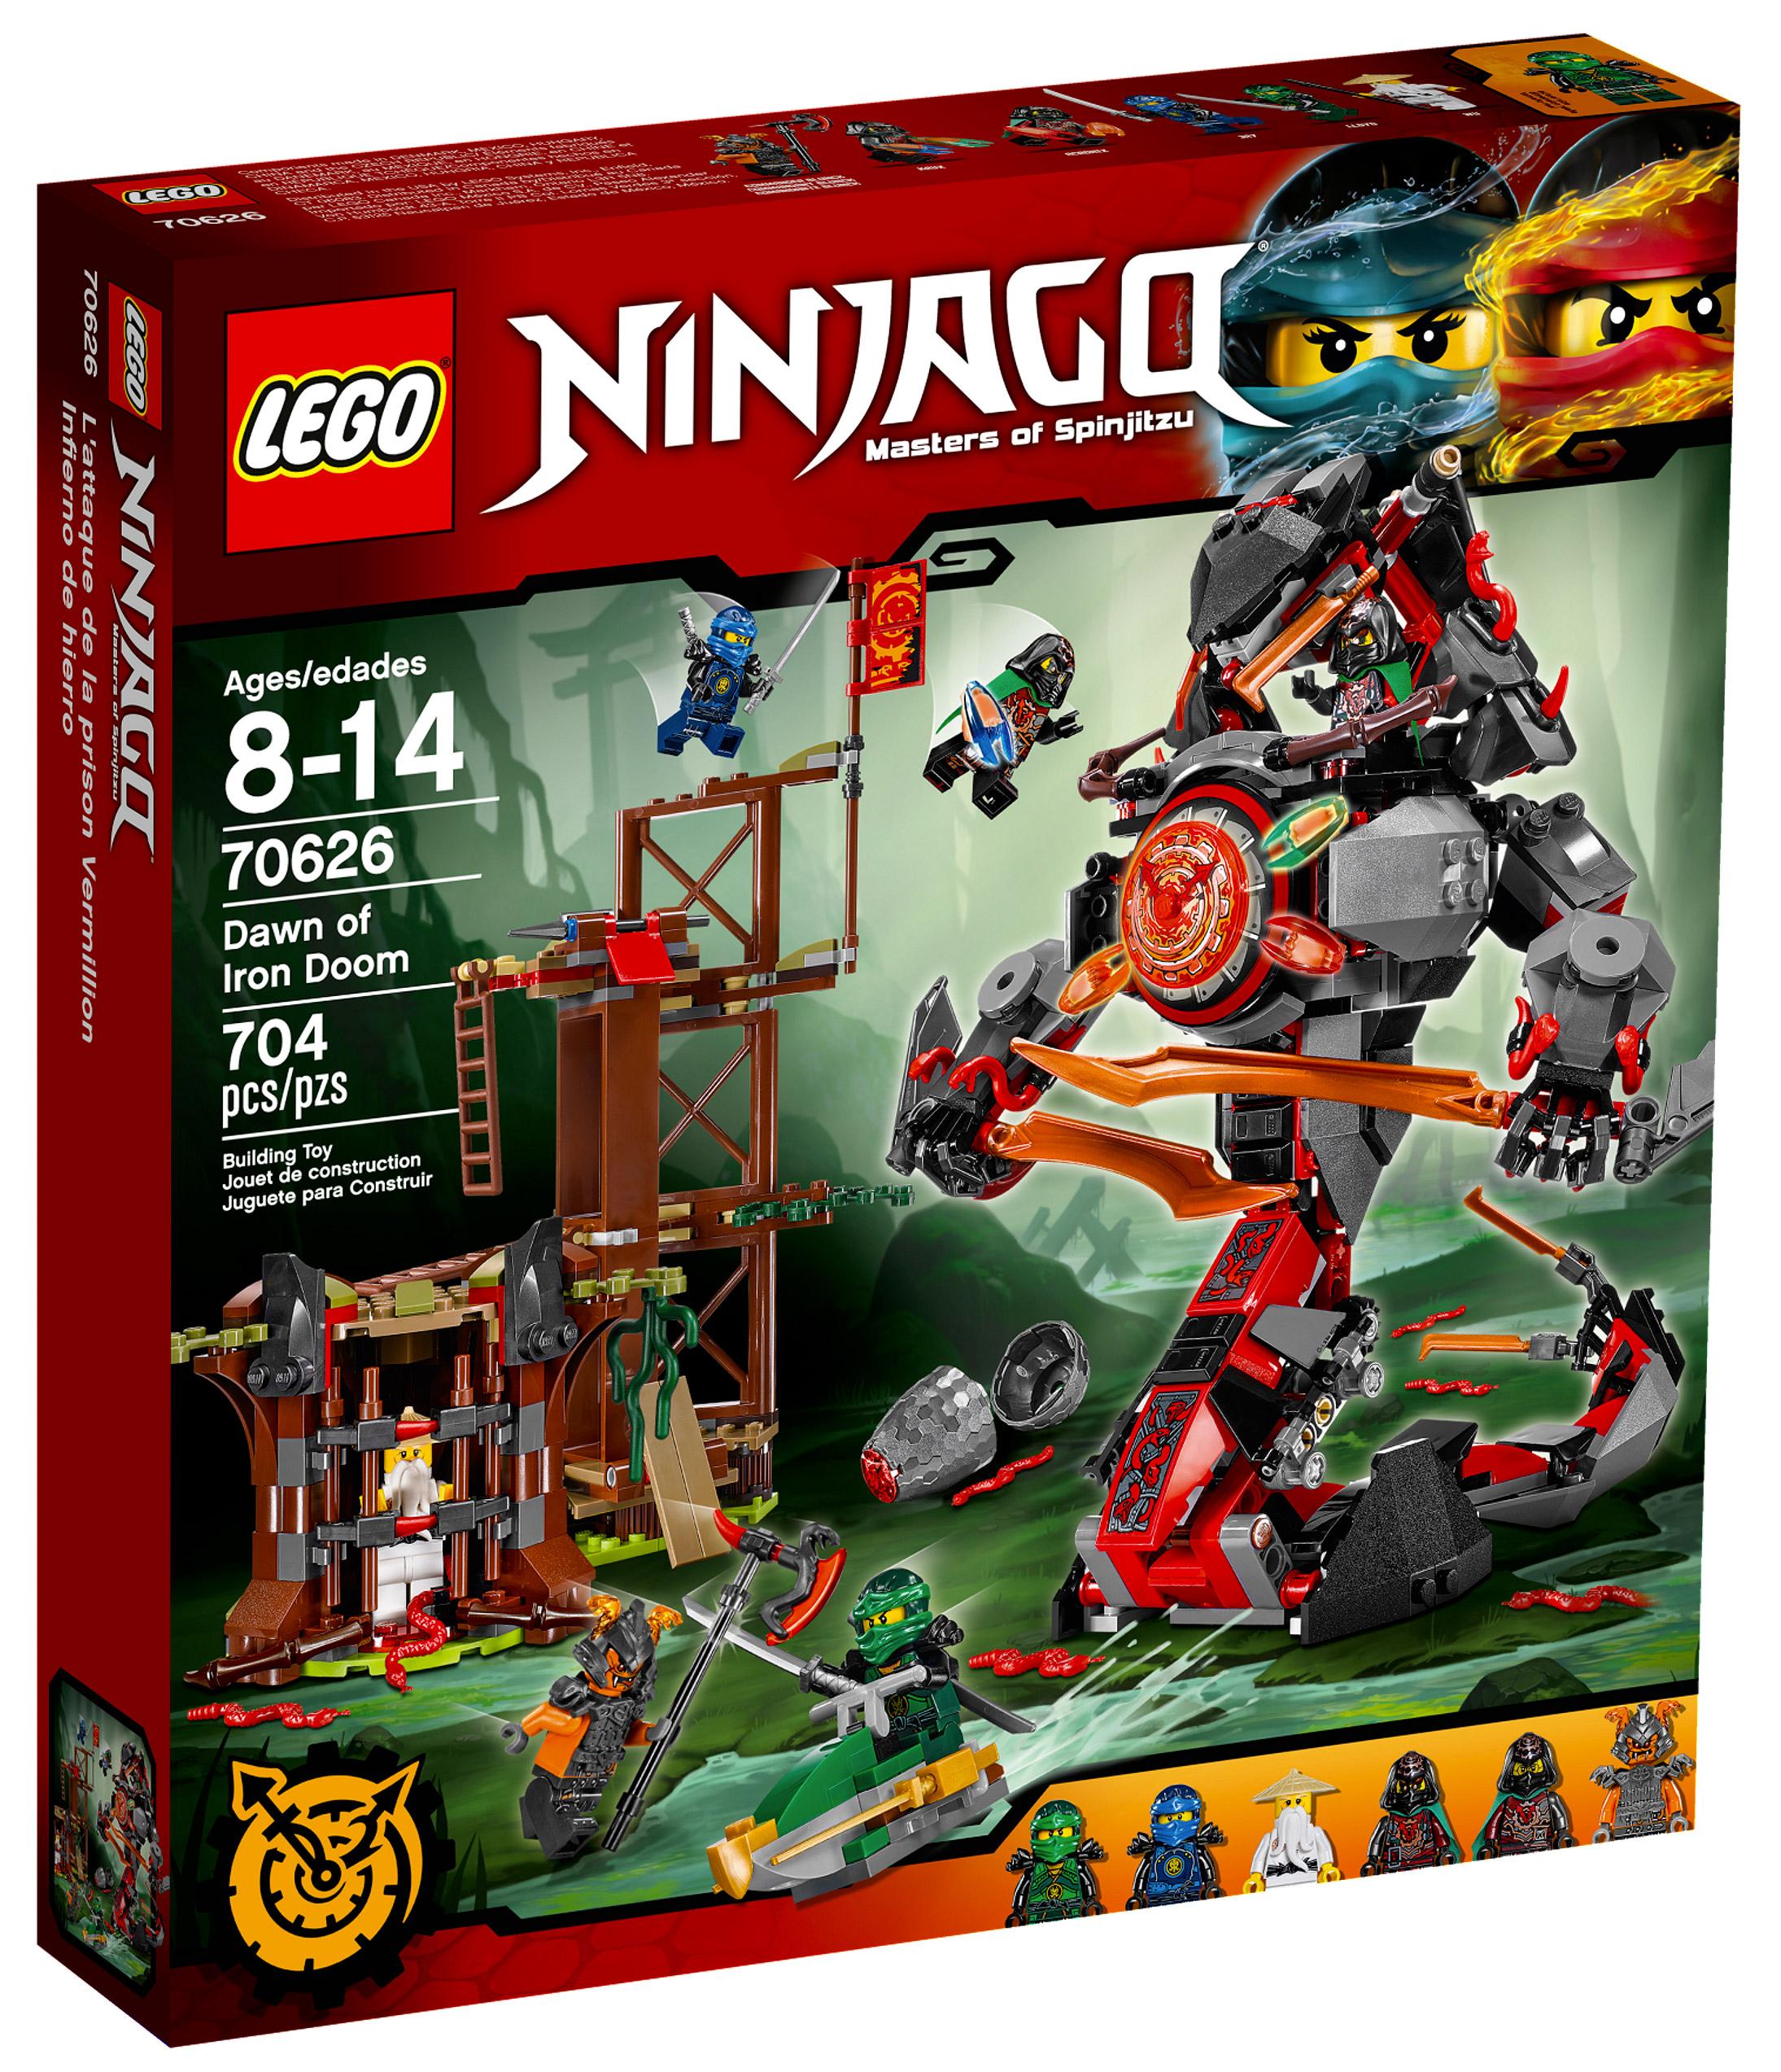 Lego ninjago 70626 pas cher l attaque de la prison vermillion - Lego ninjago 6 ...